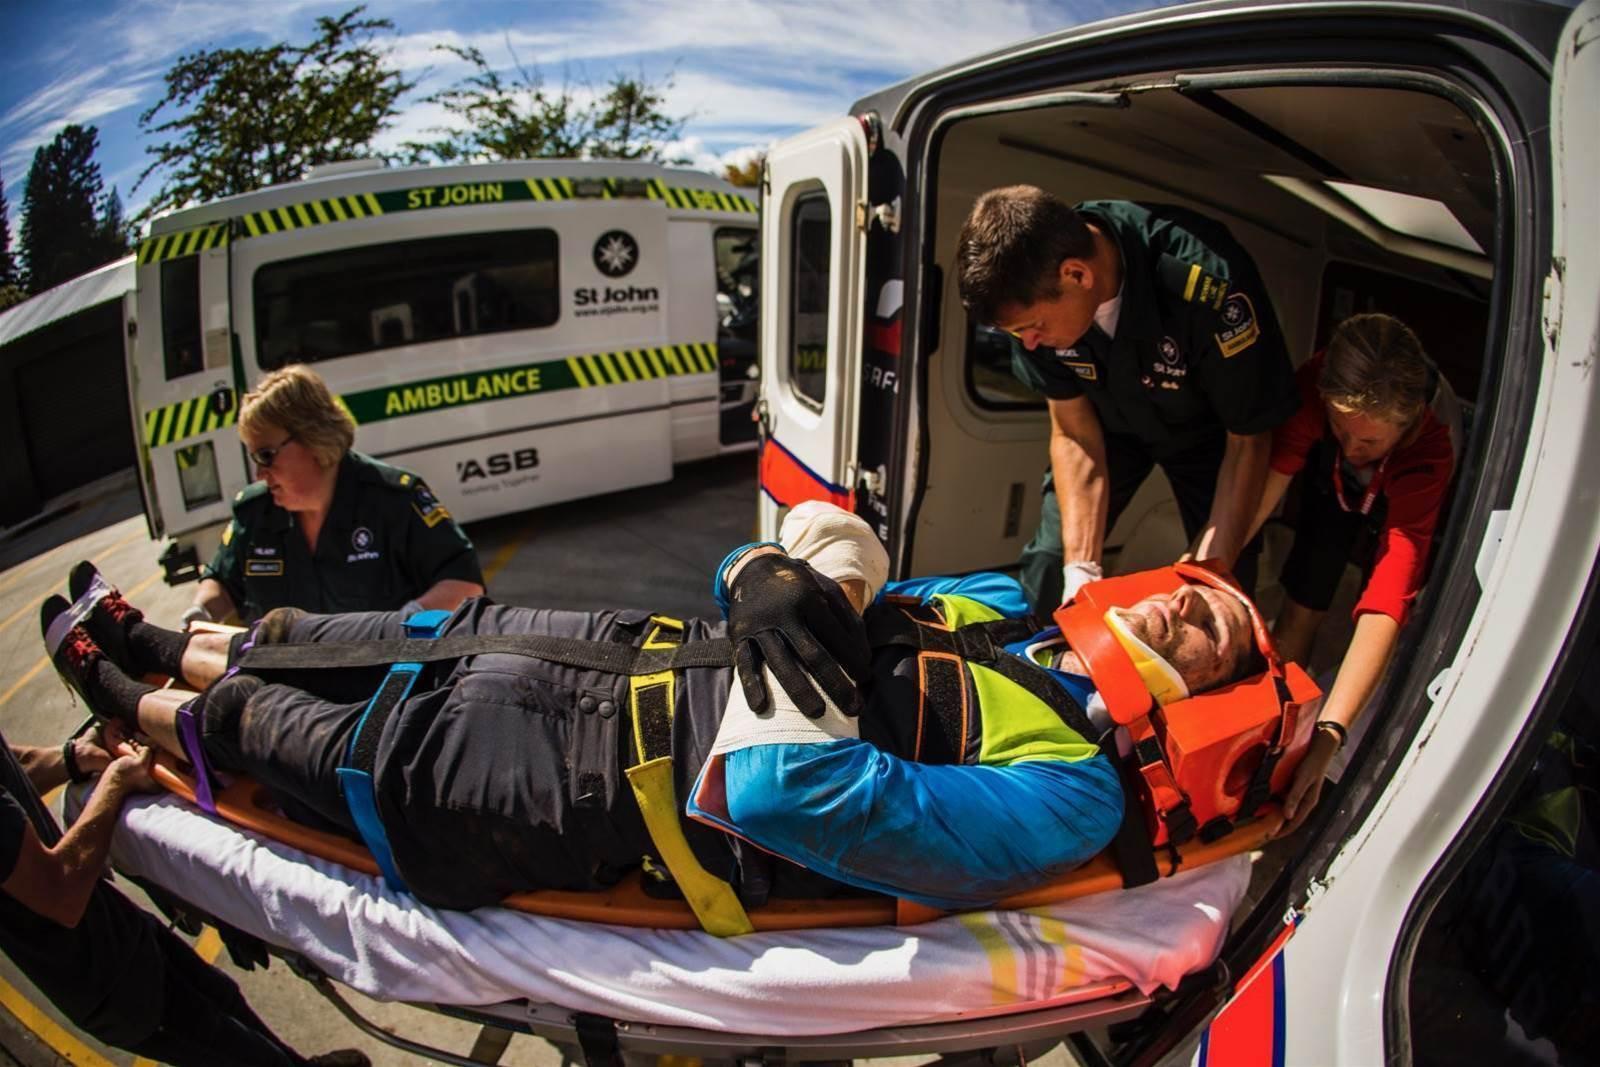 Essential First Aid